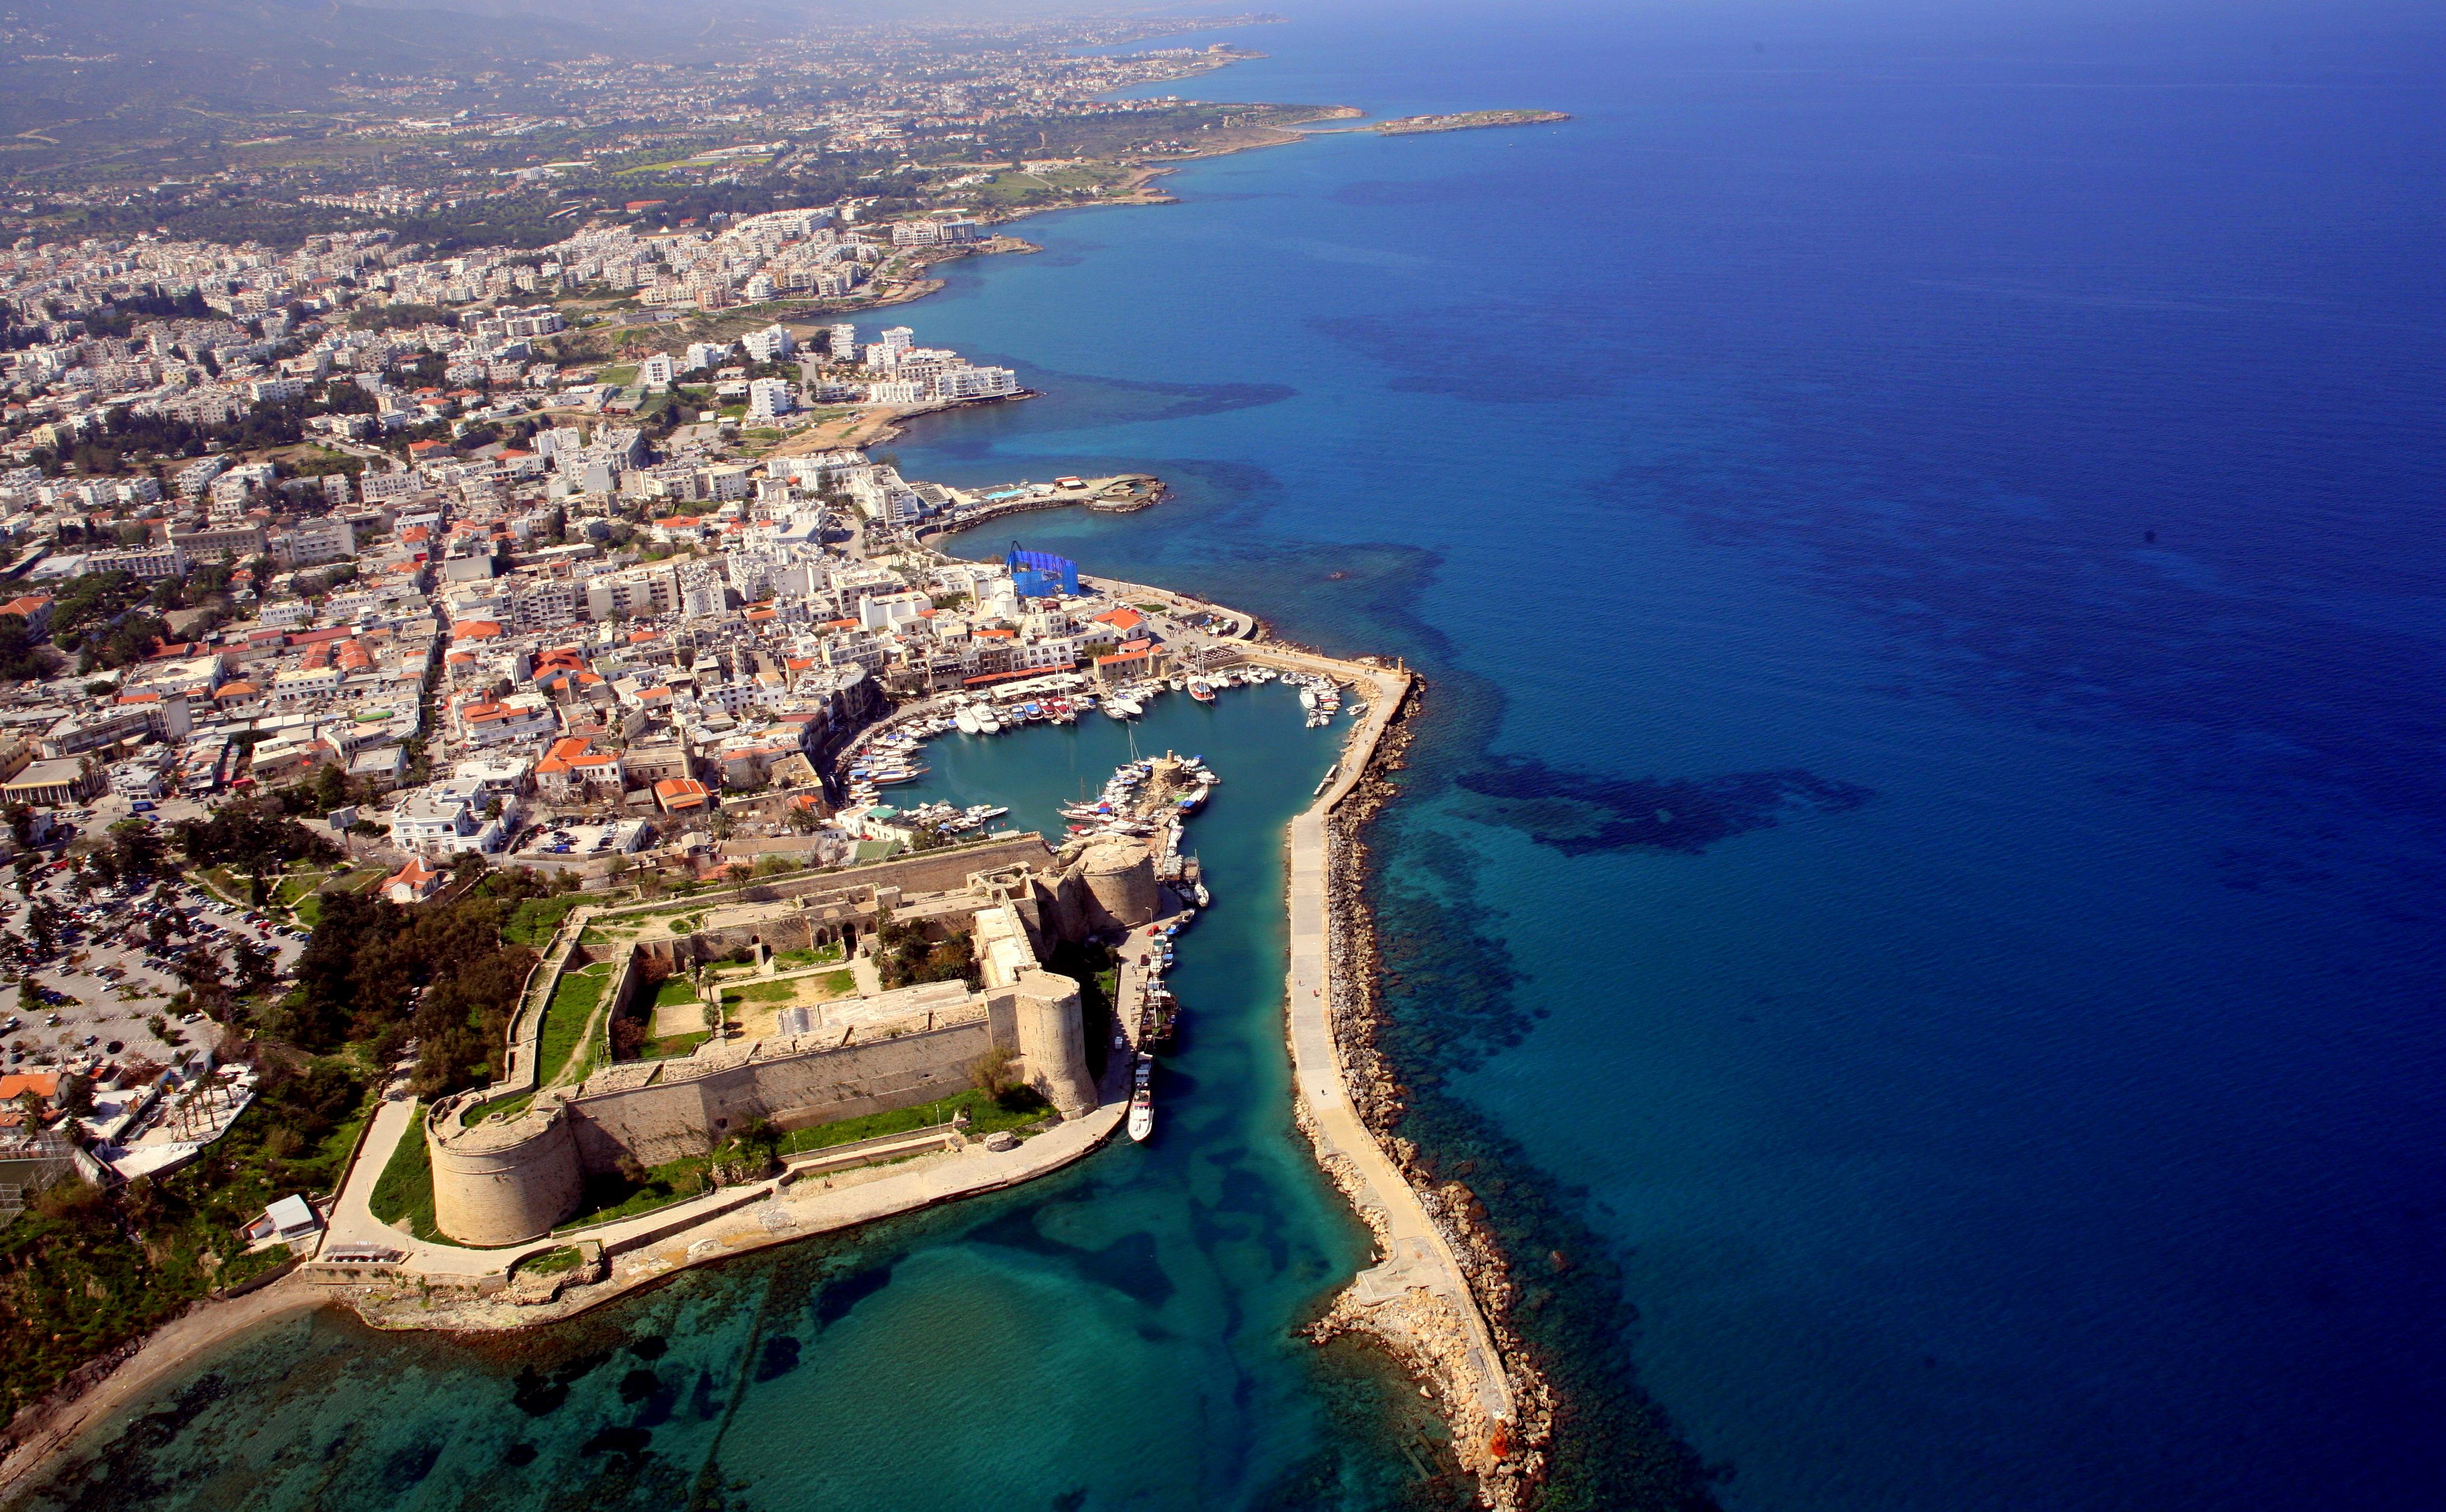 girne_from_air_harbour_gamla_hamnen_norra_cypern_magasinet